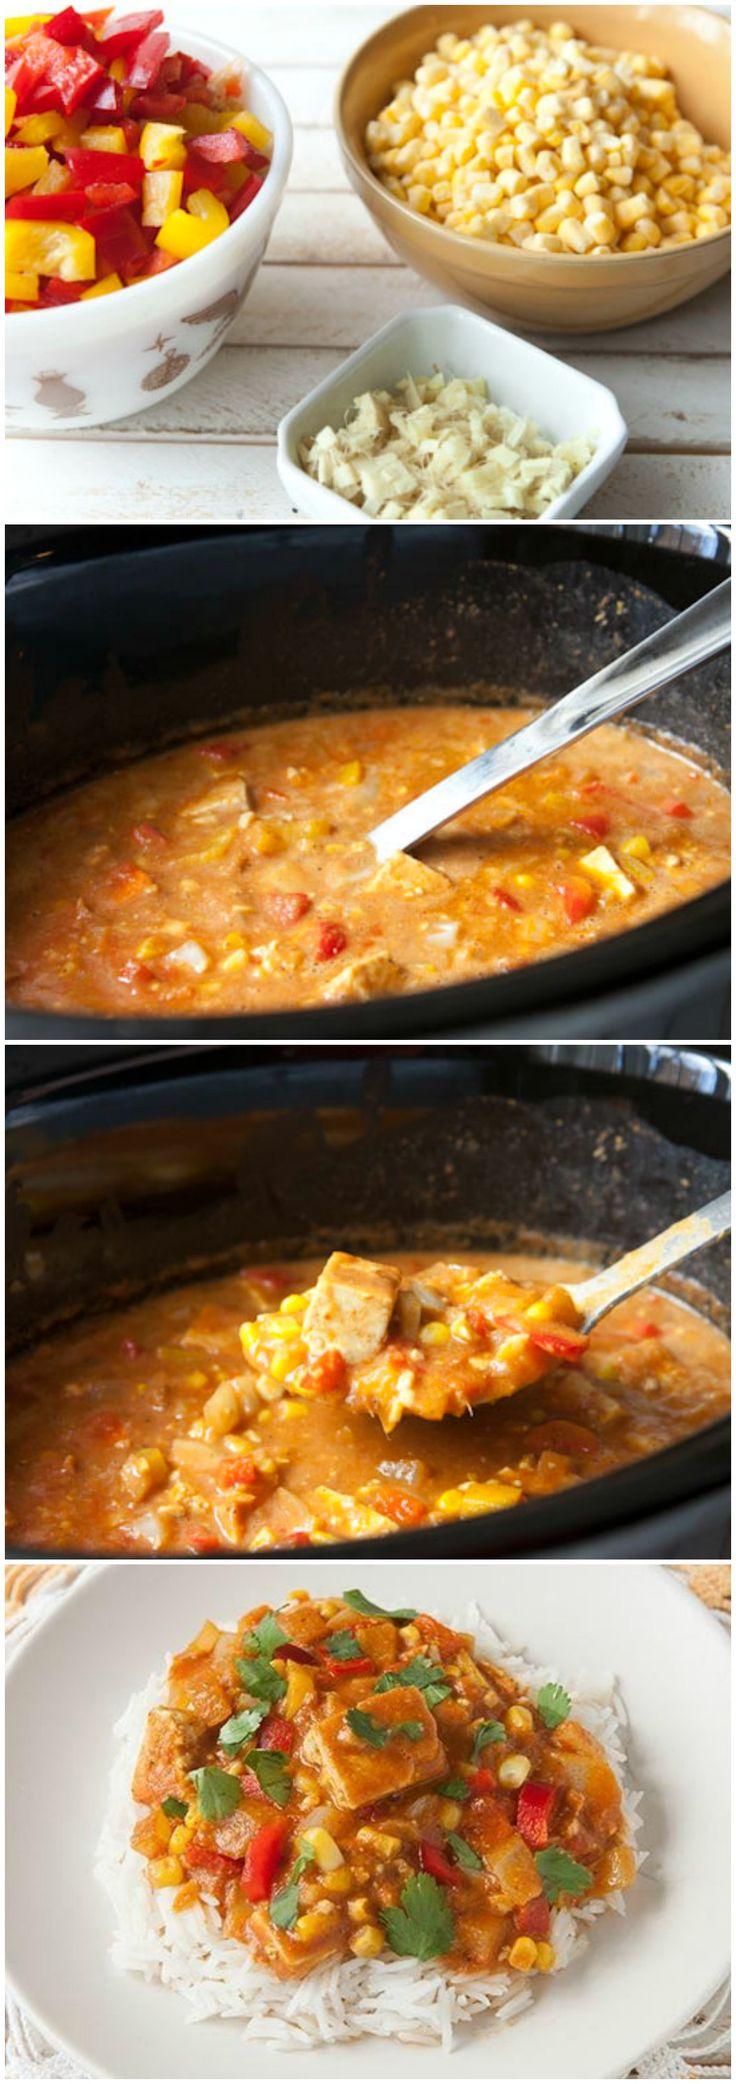 #SlowCooker Tofu Curry